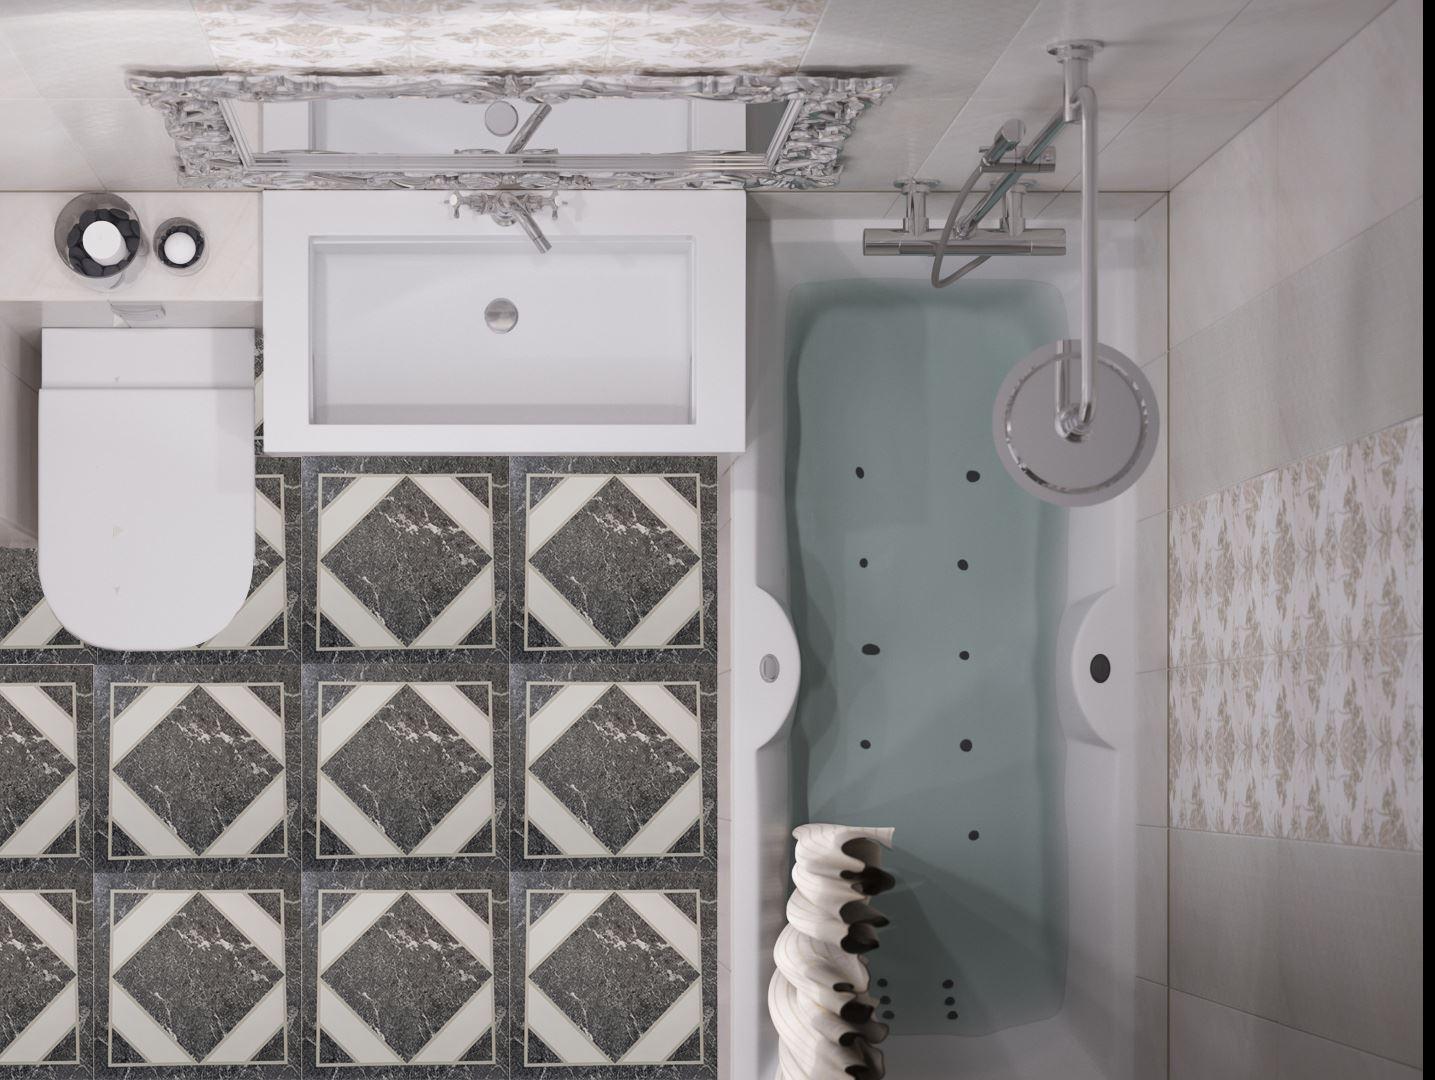 Floor tiles adhesive vinyl flooring kitchen bathroom grey black